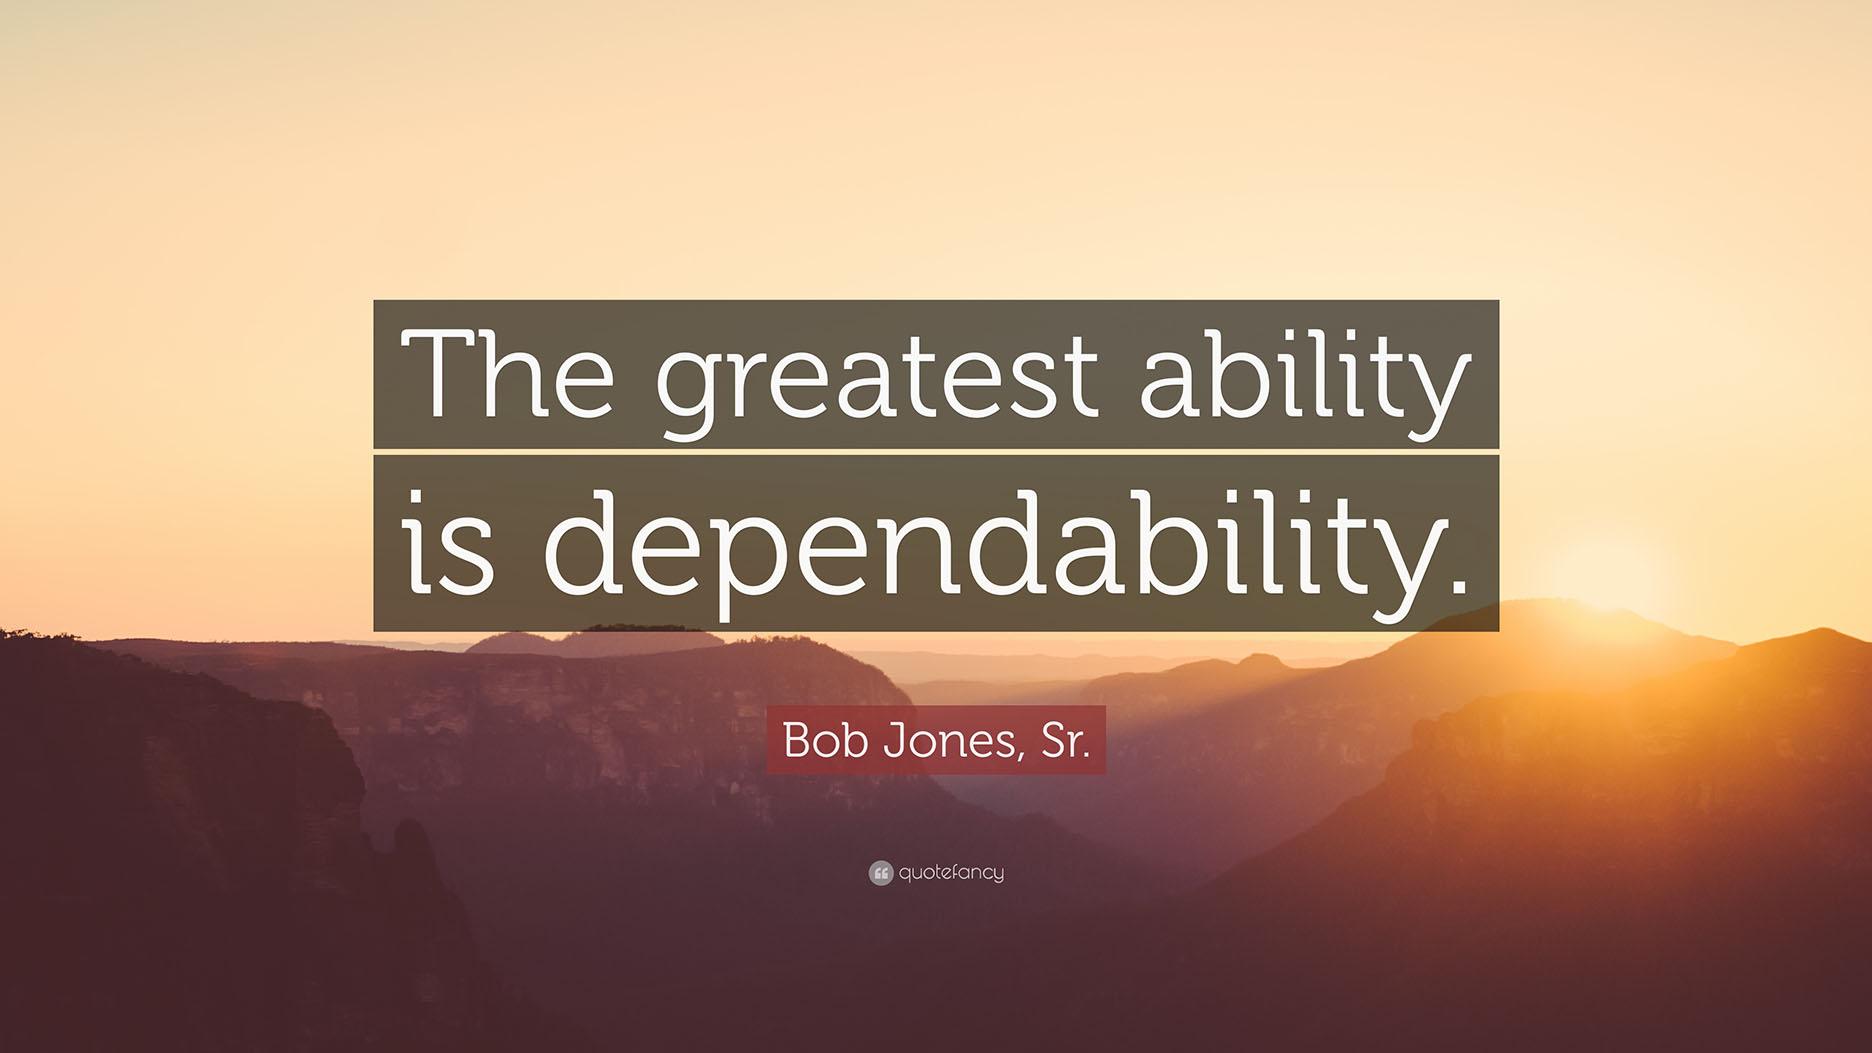 Dependability quote